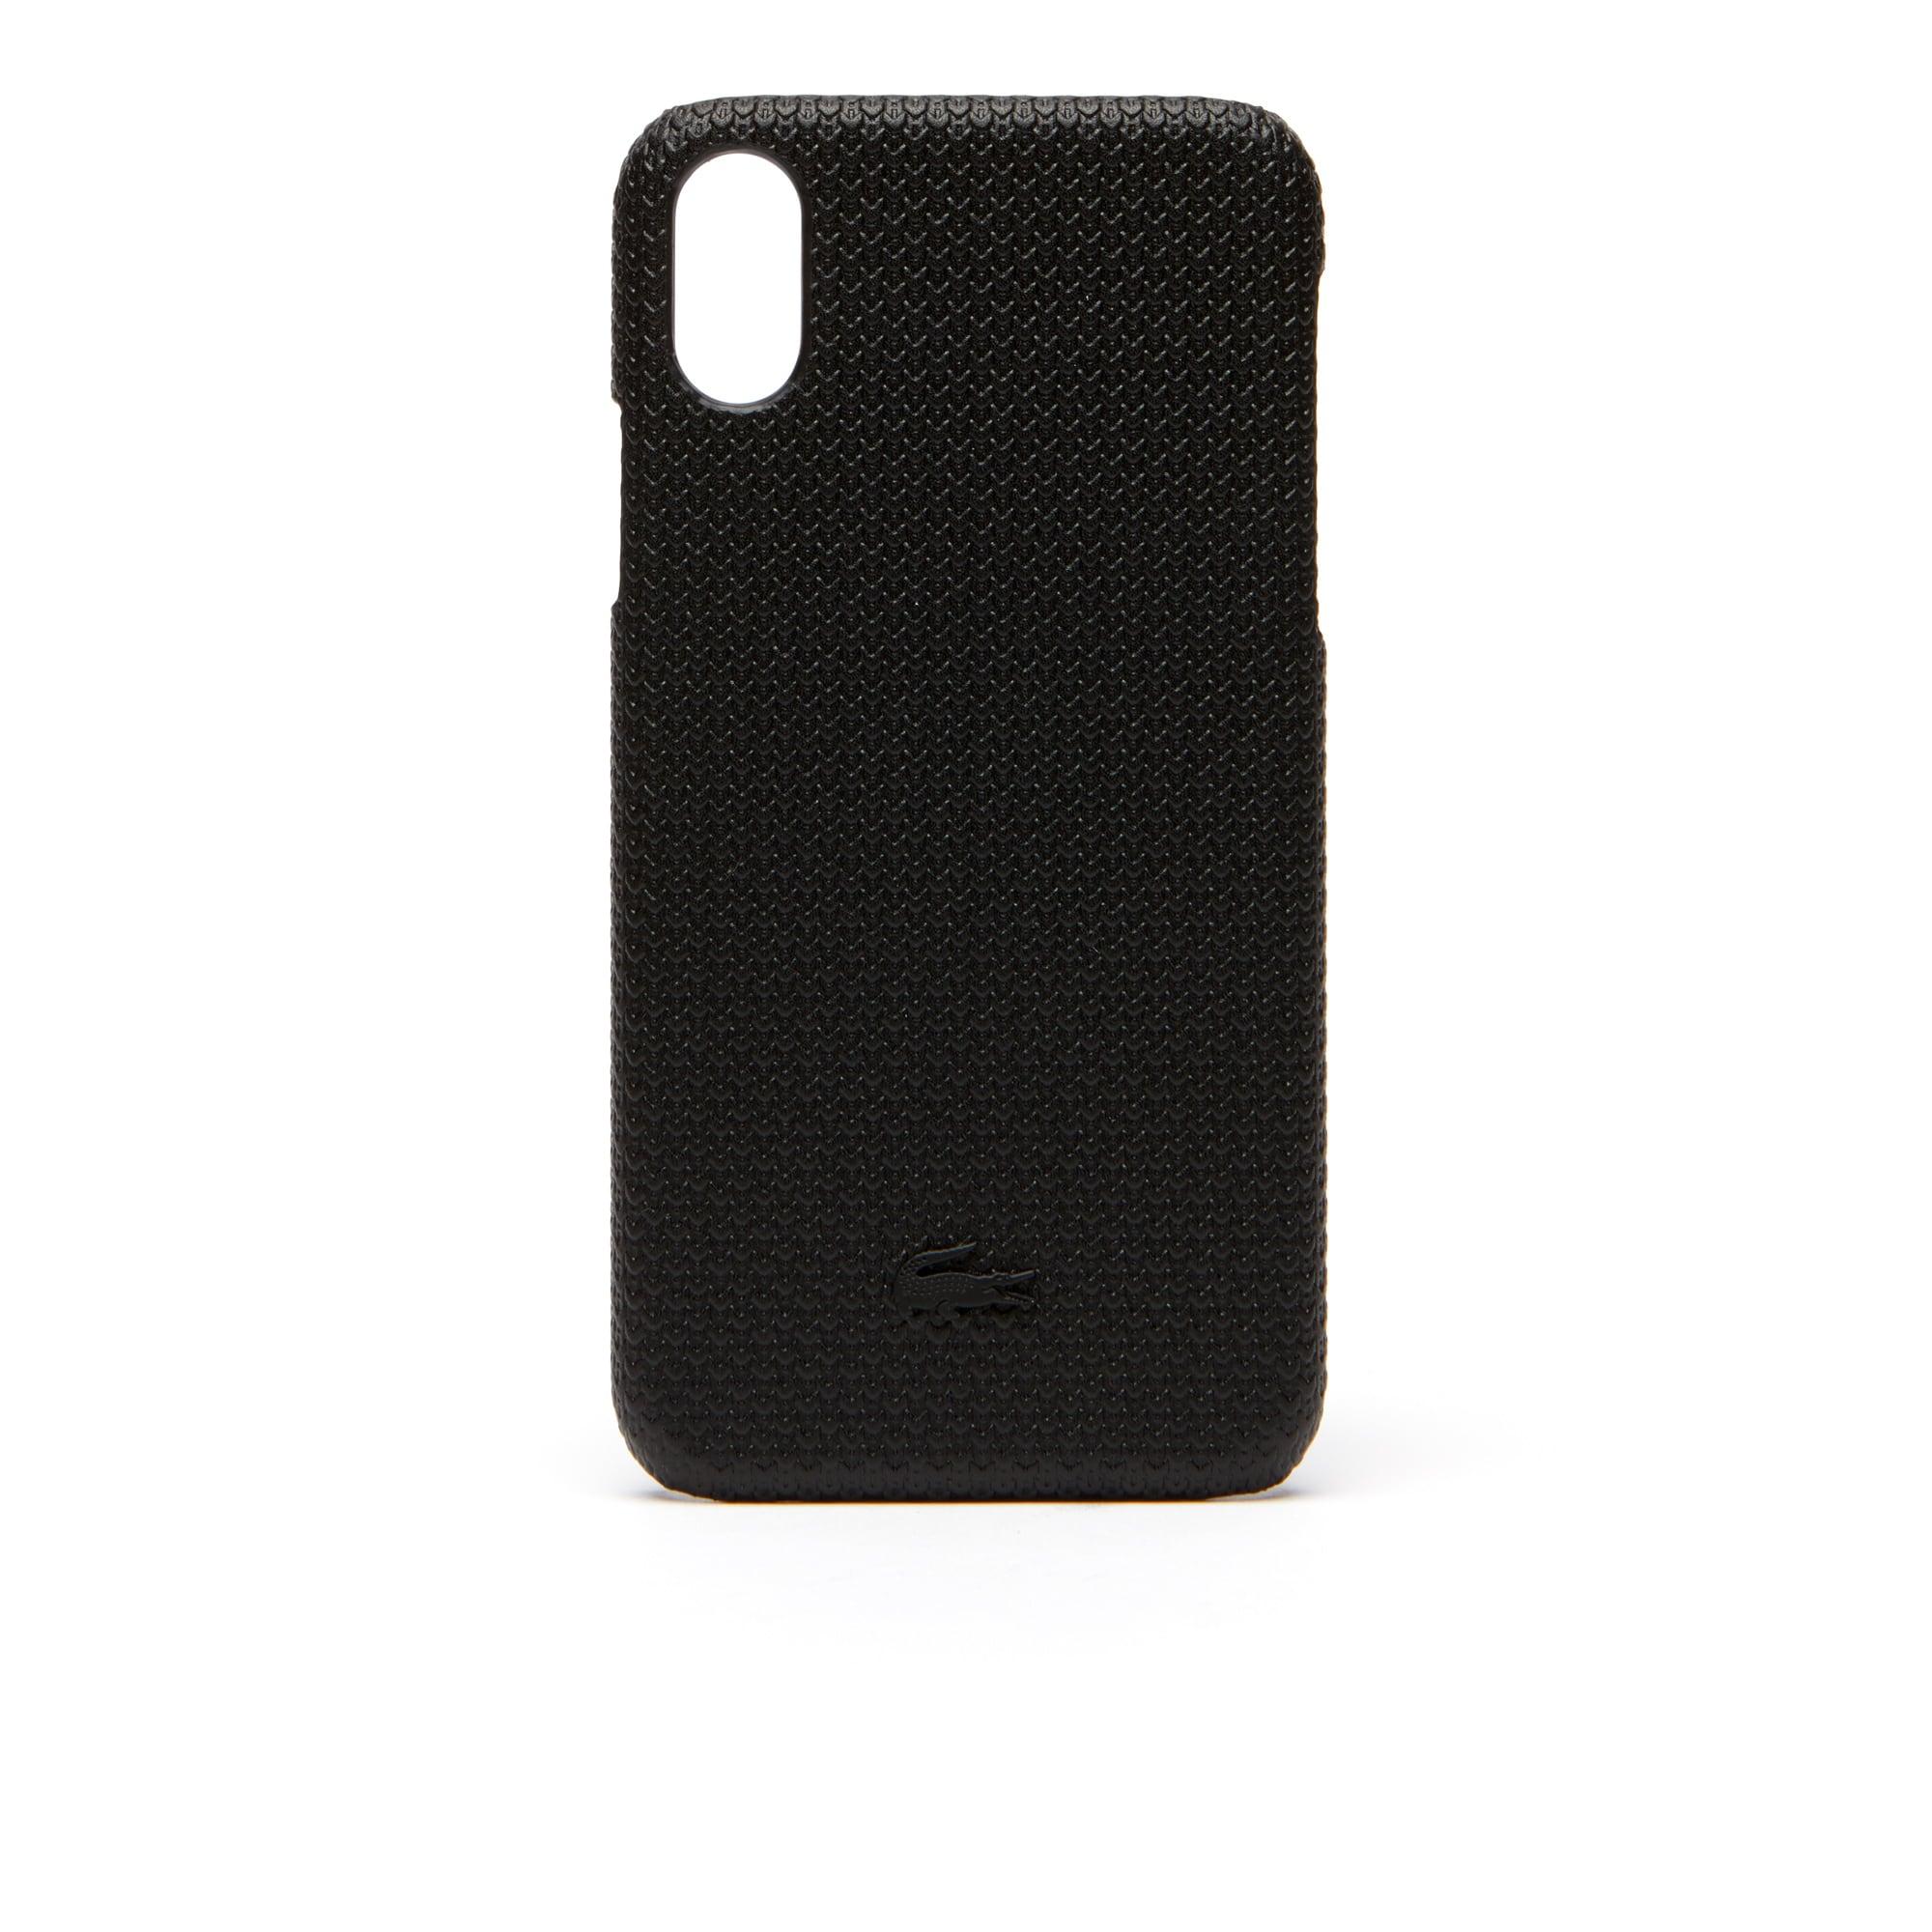 Coque iPhone X Chantaco en cuir piqué mat uni